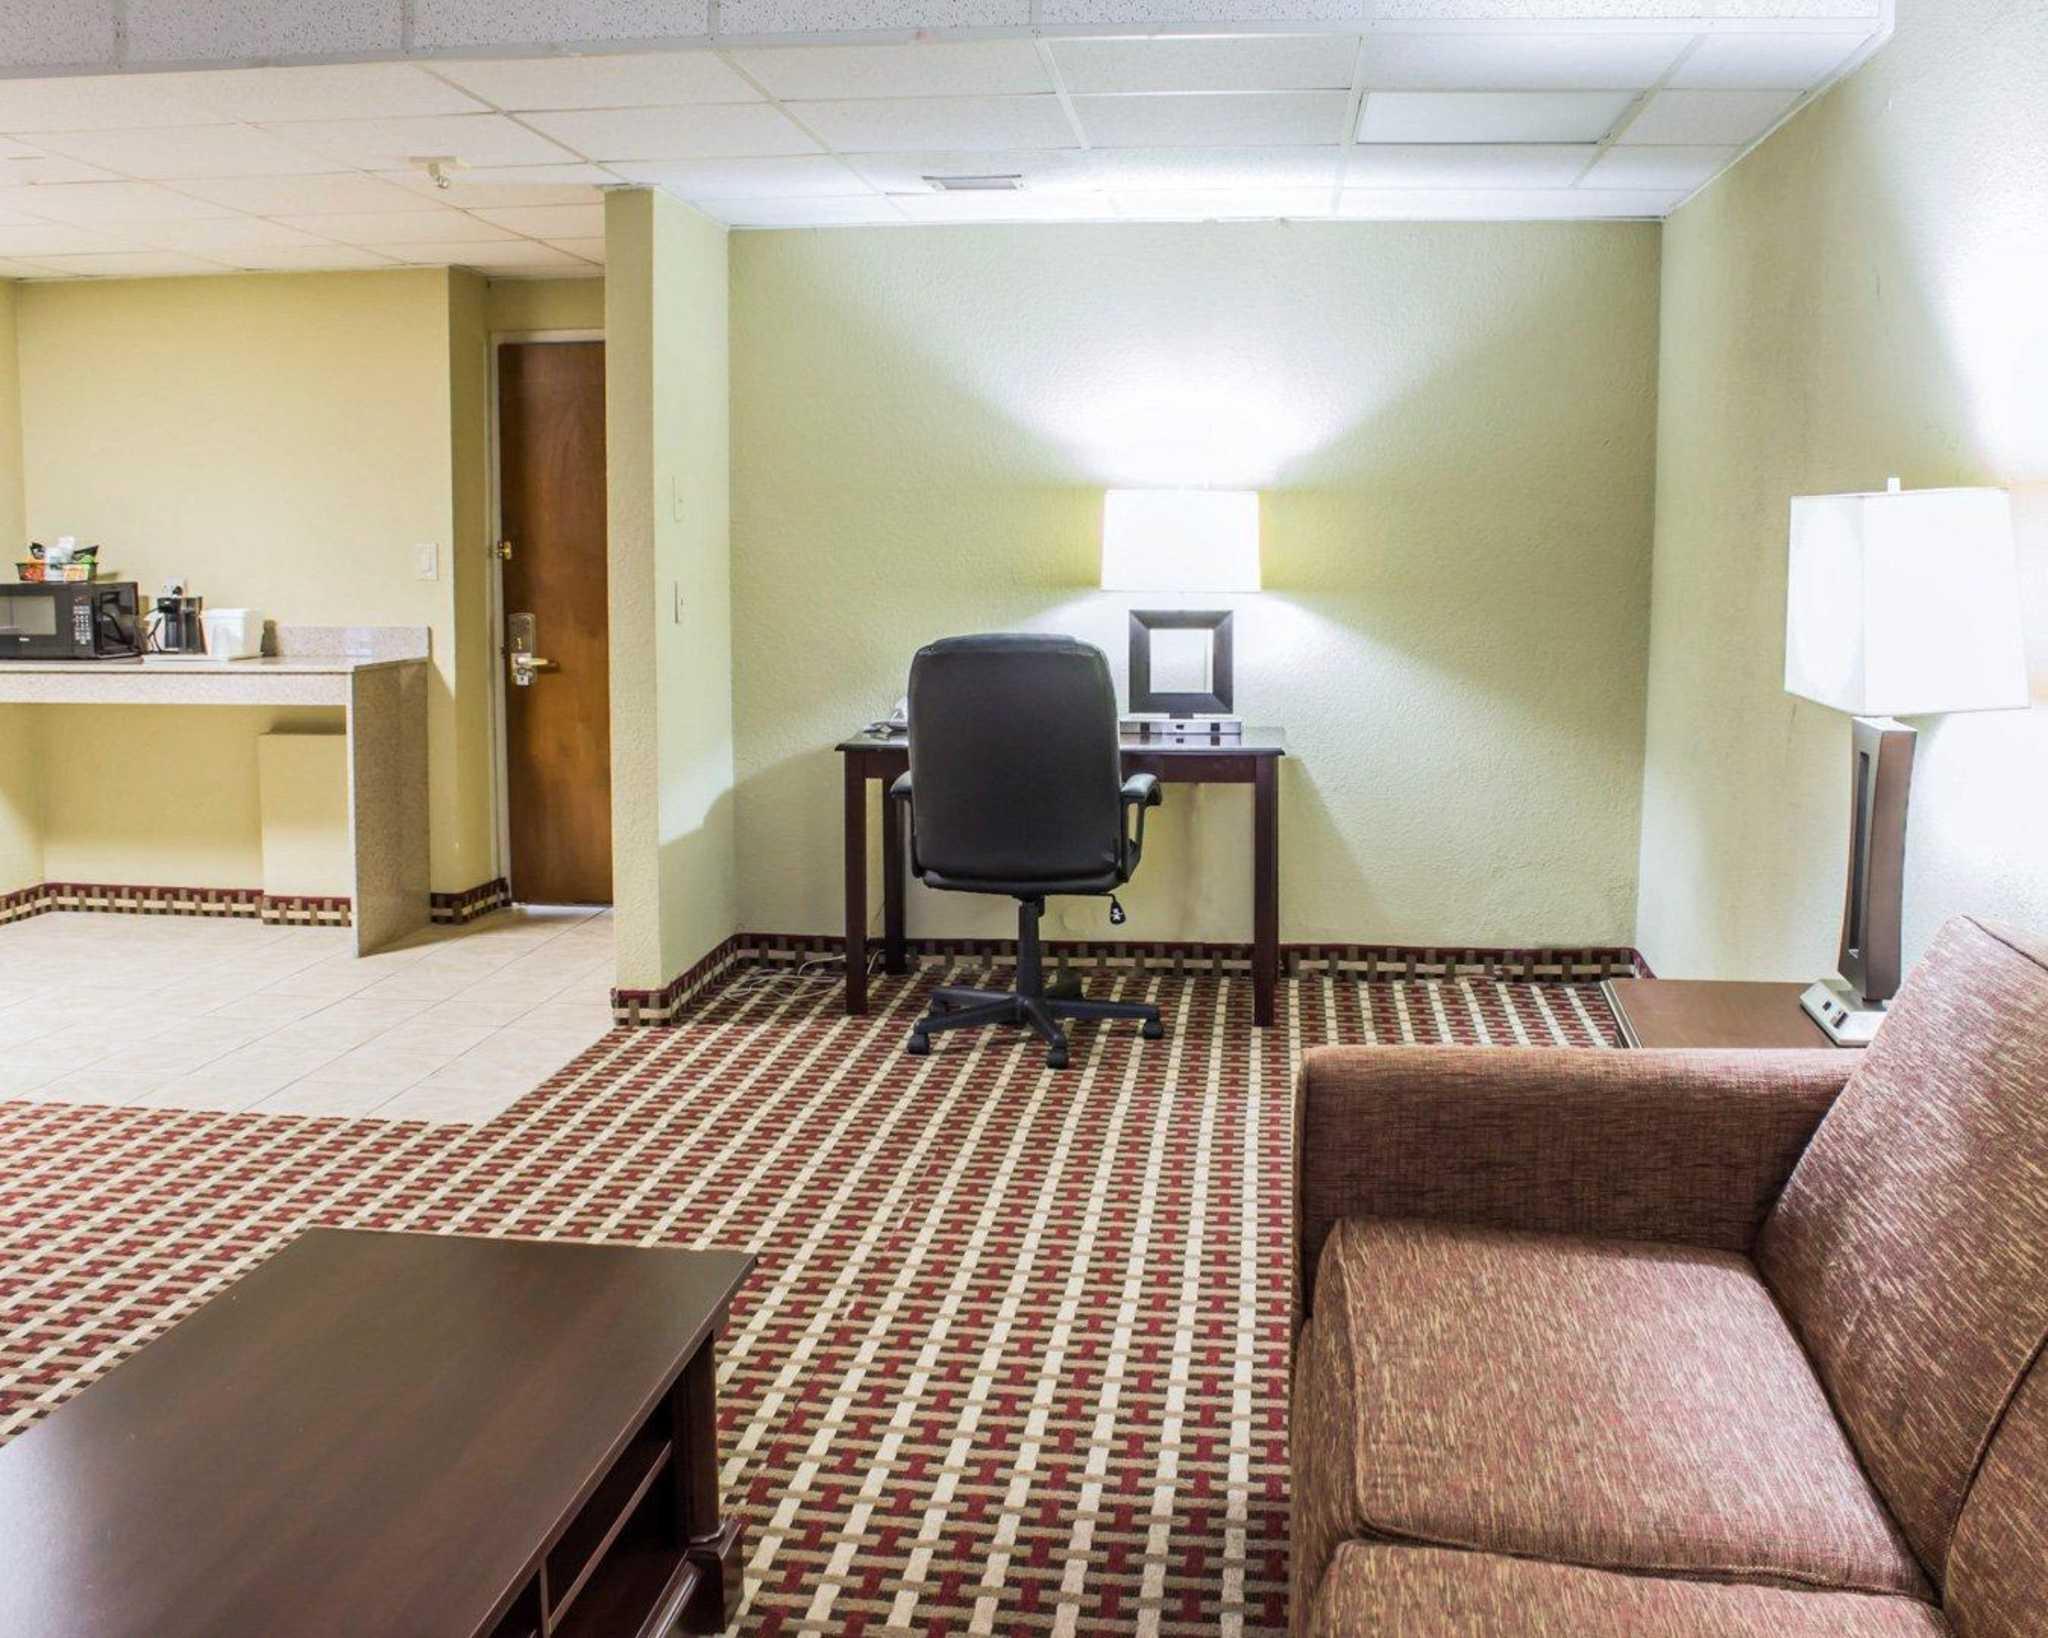 Quality Inn & Suites Fort Bragg image 23